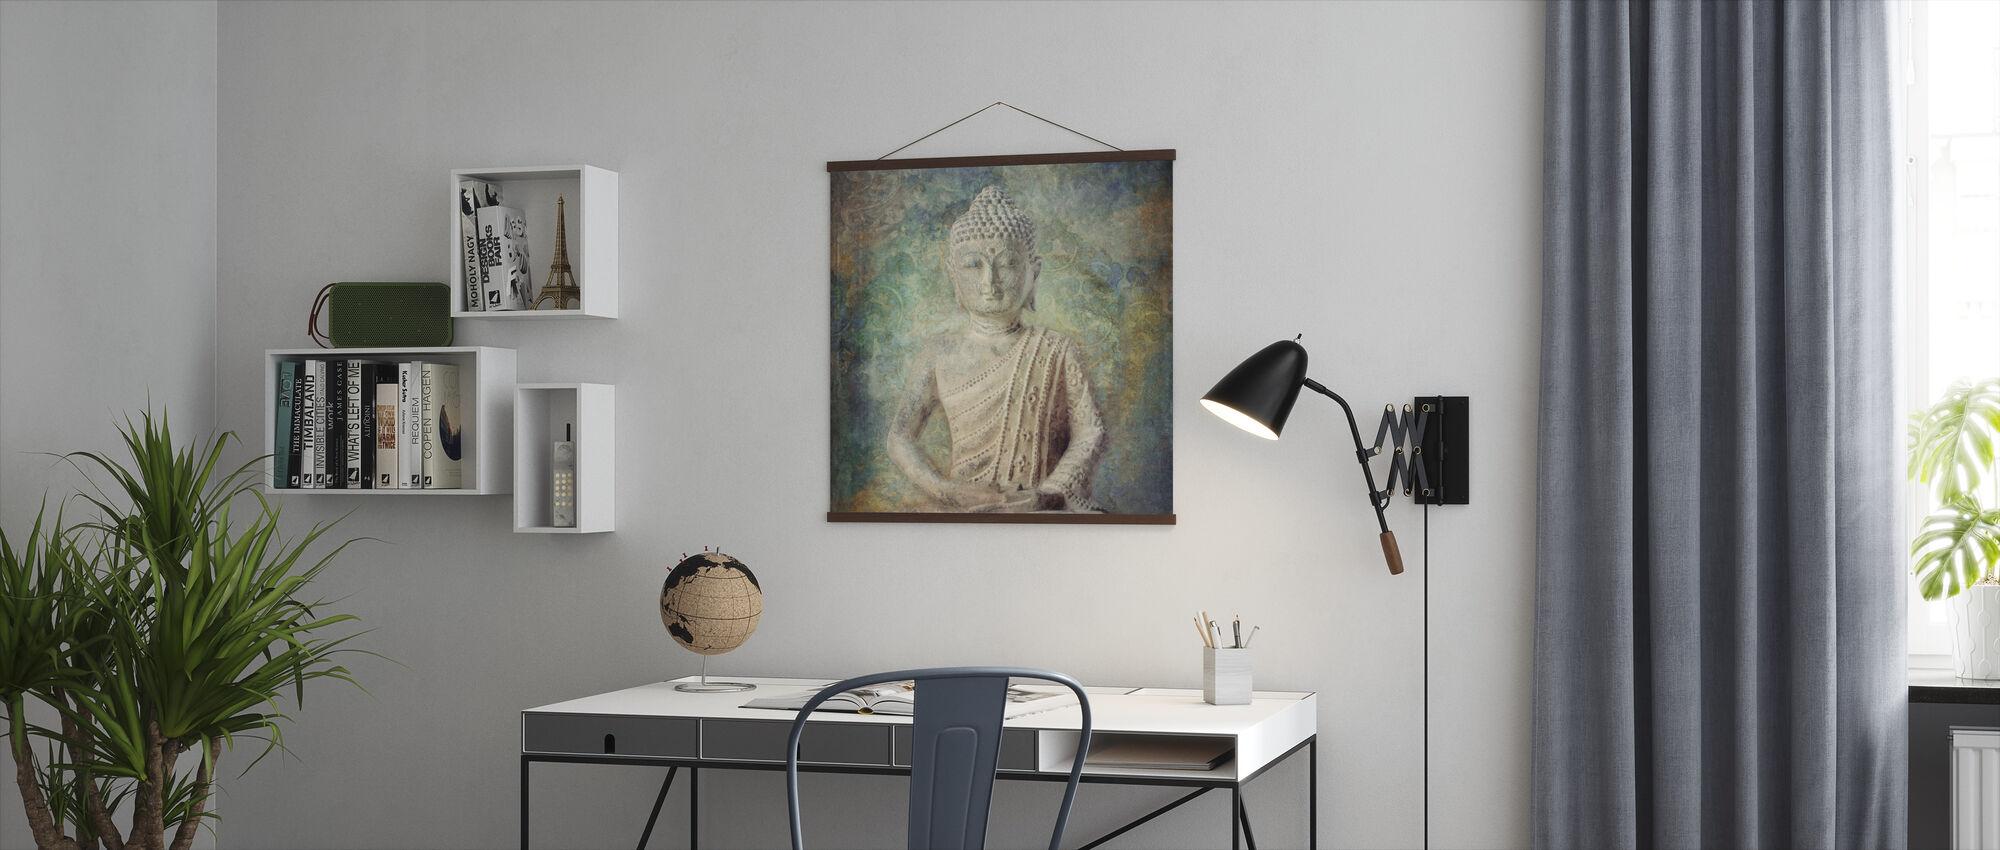 Rustige Boeddha kwadraat - Poster - Kantoor